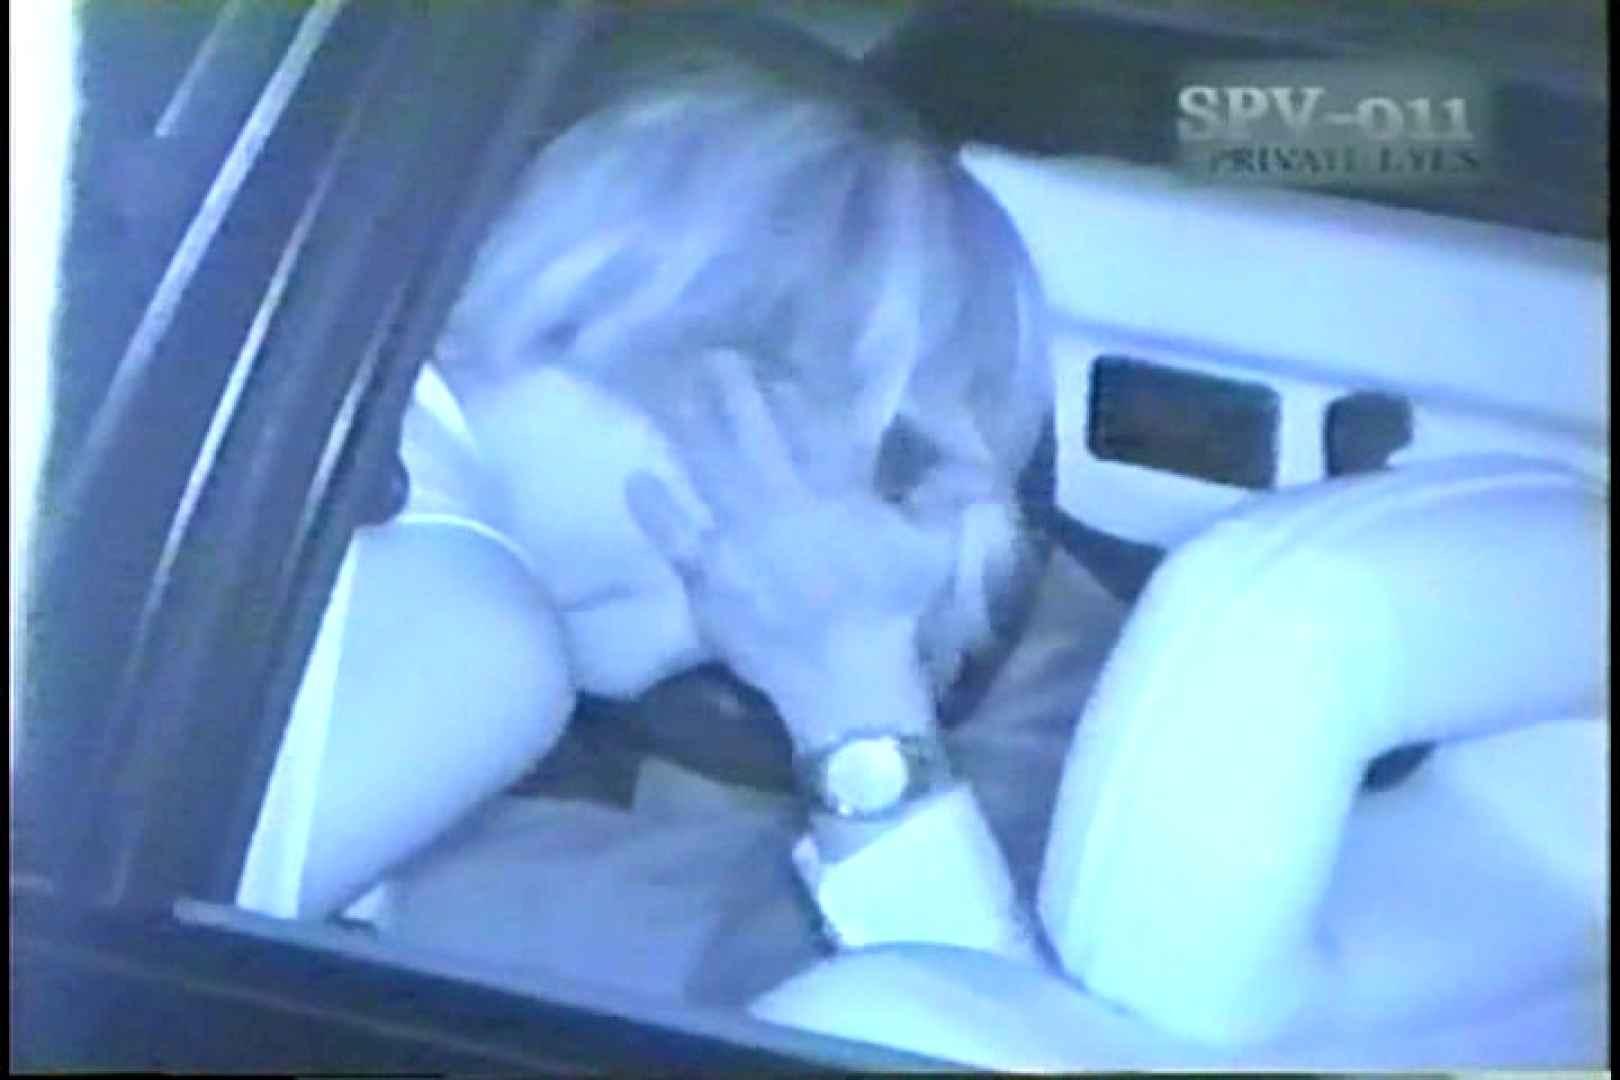 高画質版!SPD-011 盗撮 カーセックス黙示録 (VHS) セックス | カーセックス  94連発 49